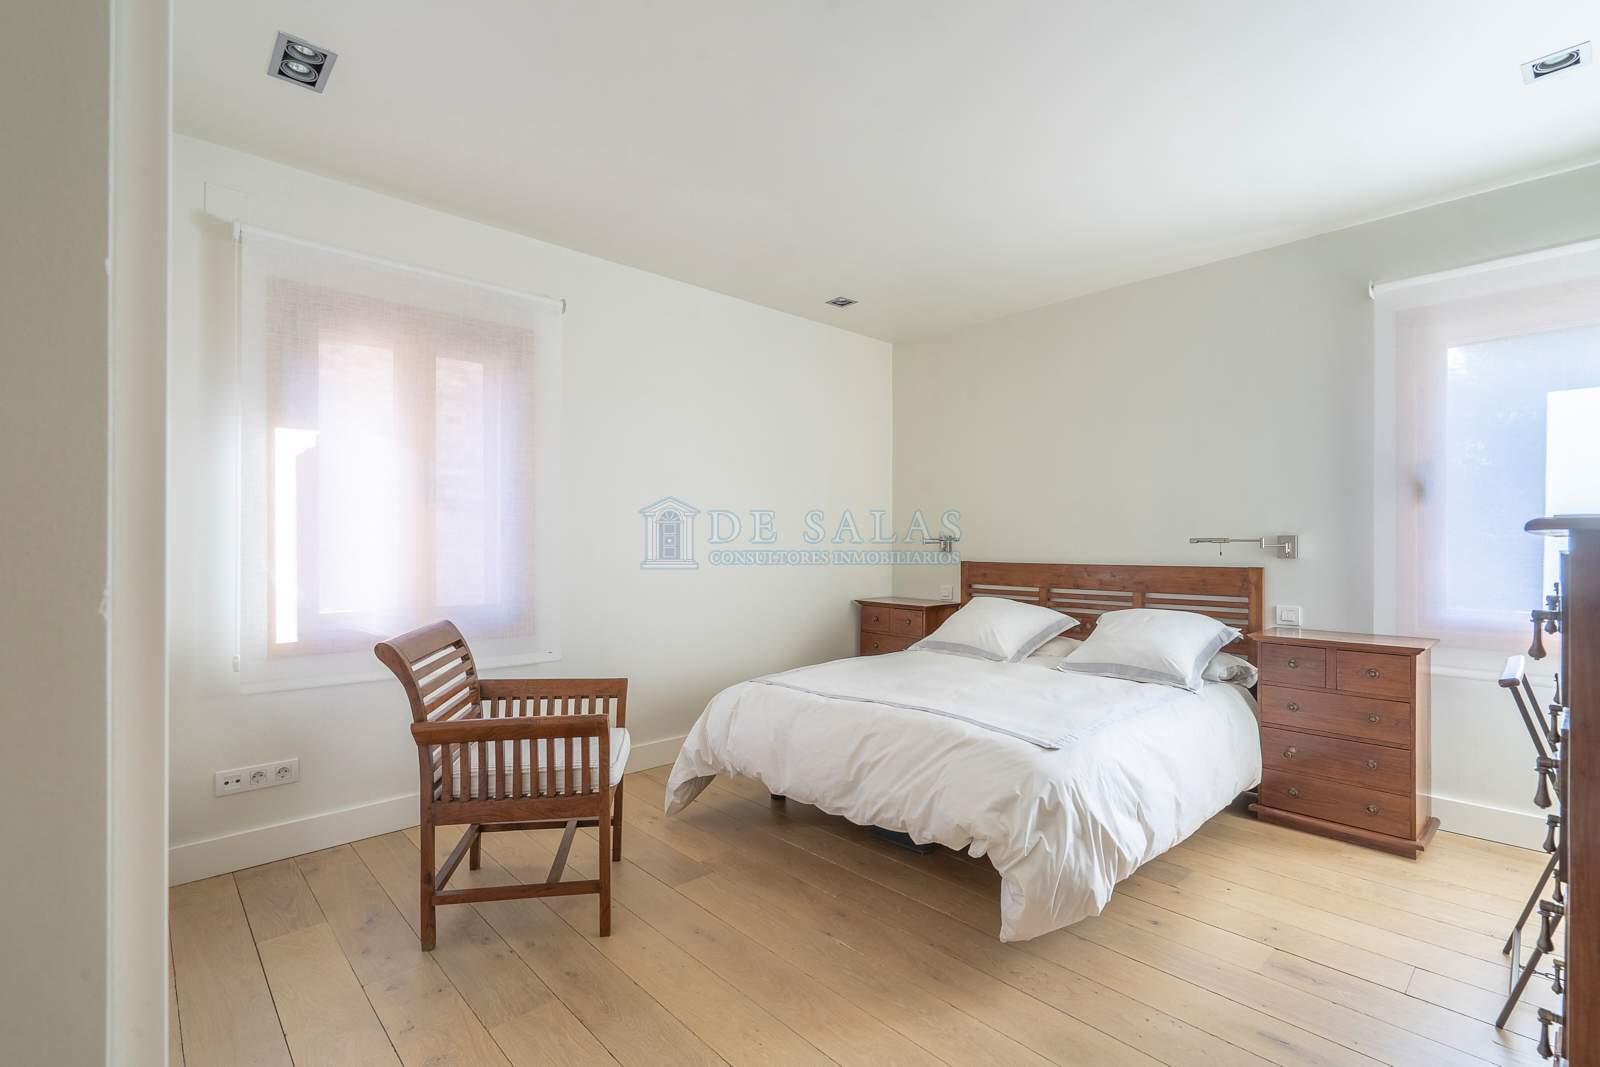 Dormitorio-36 Chalet La Moraleja